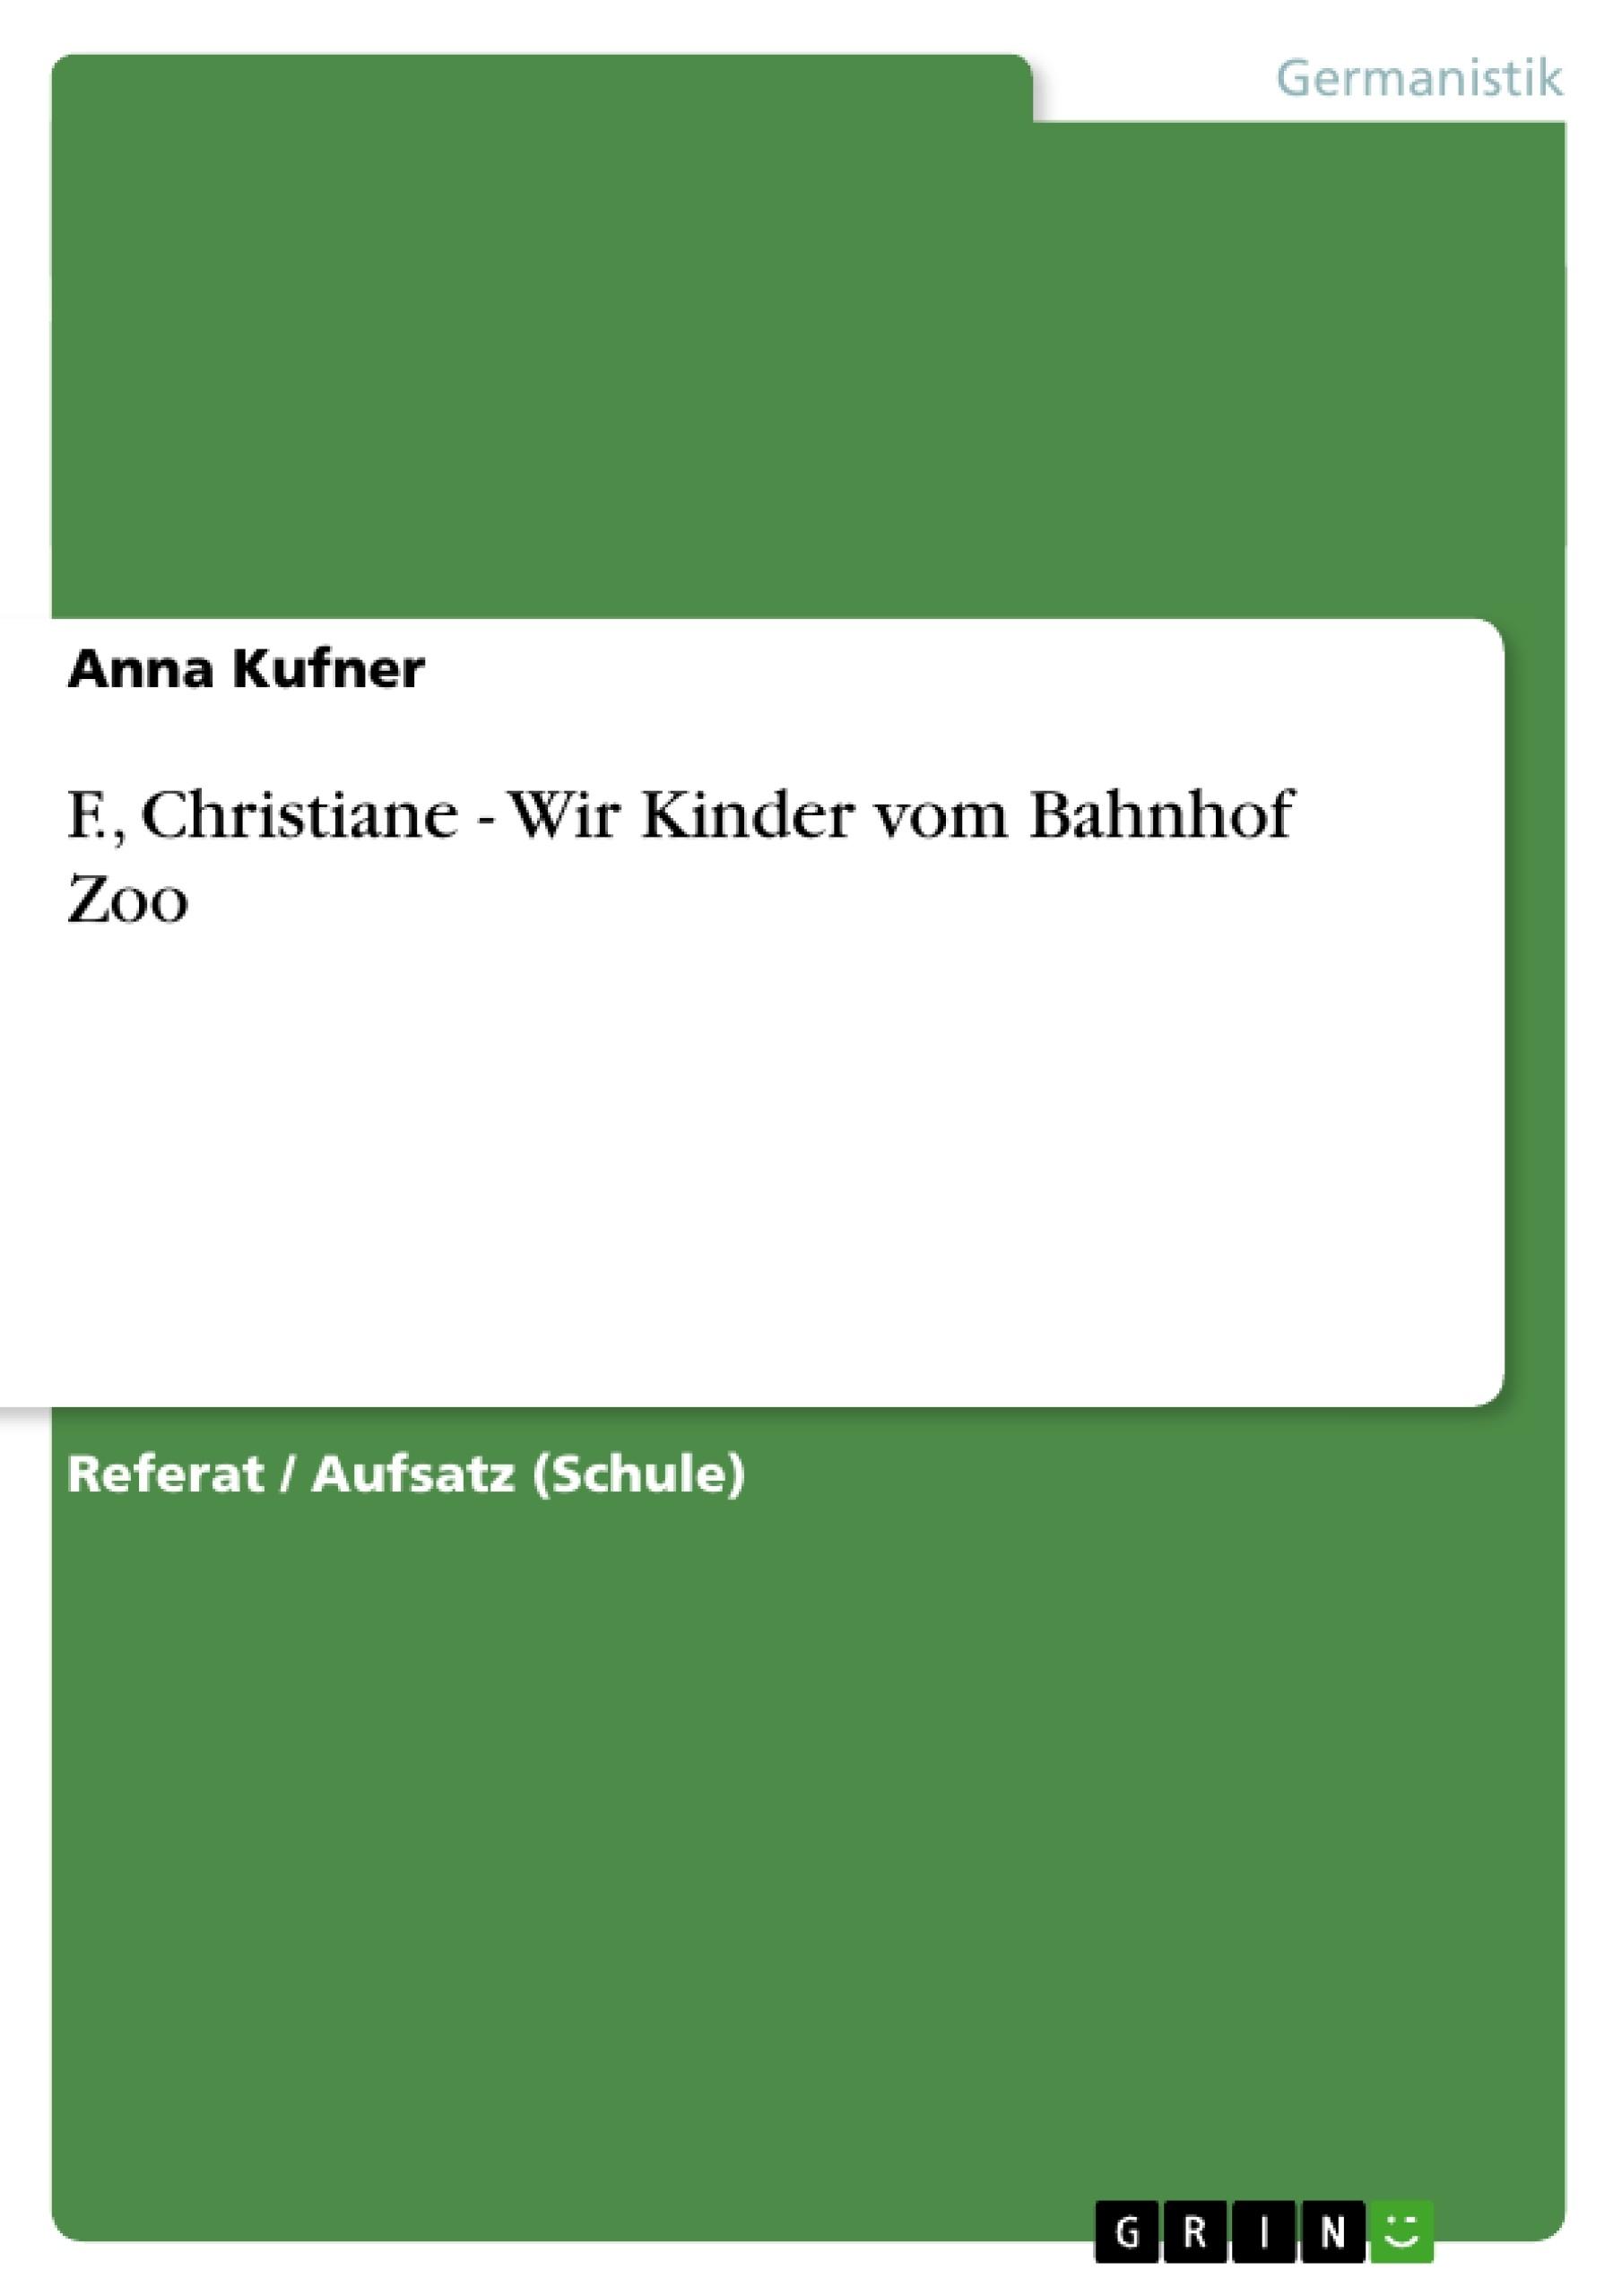 Titel: F., Christiane - Wir Kinder vom Bahnhof Zoo